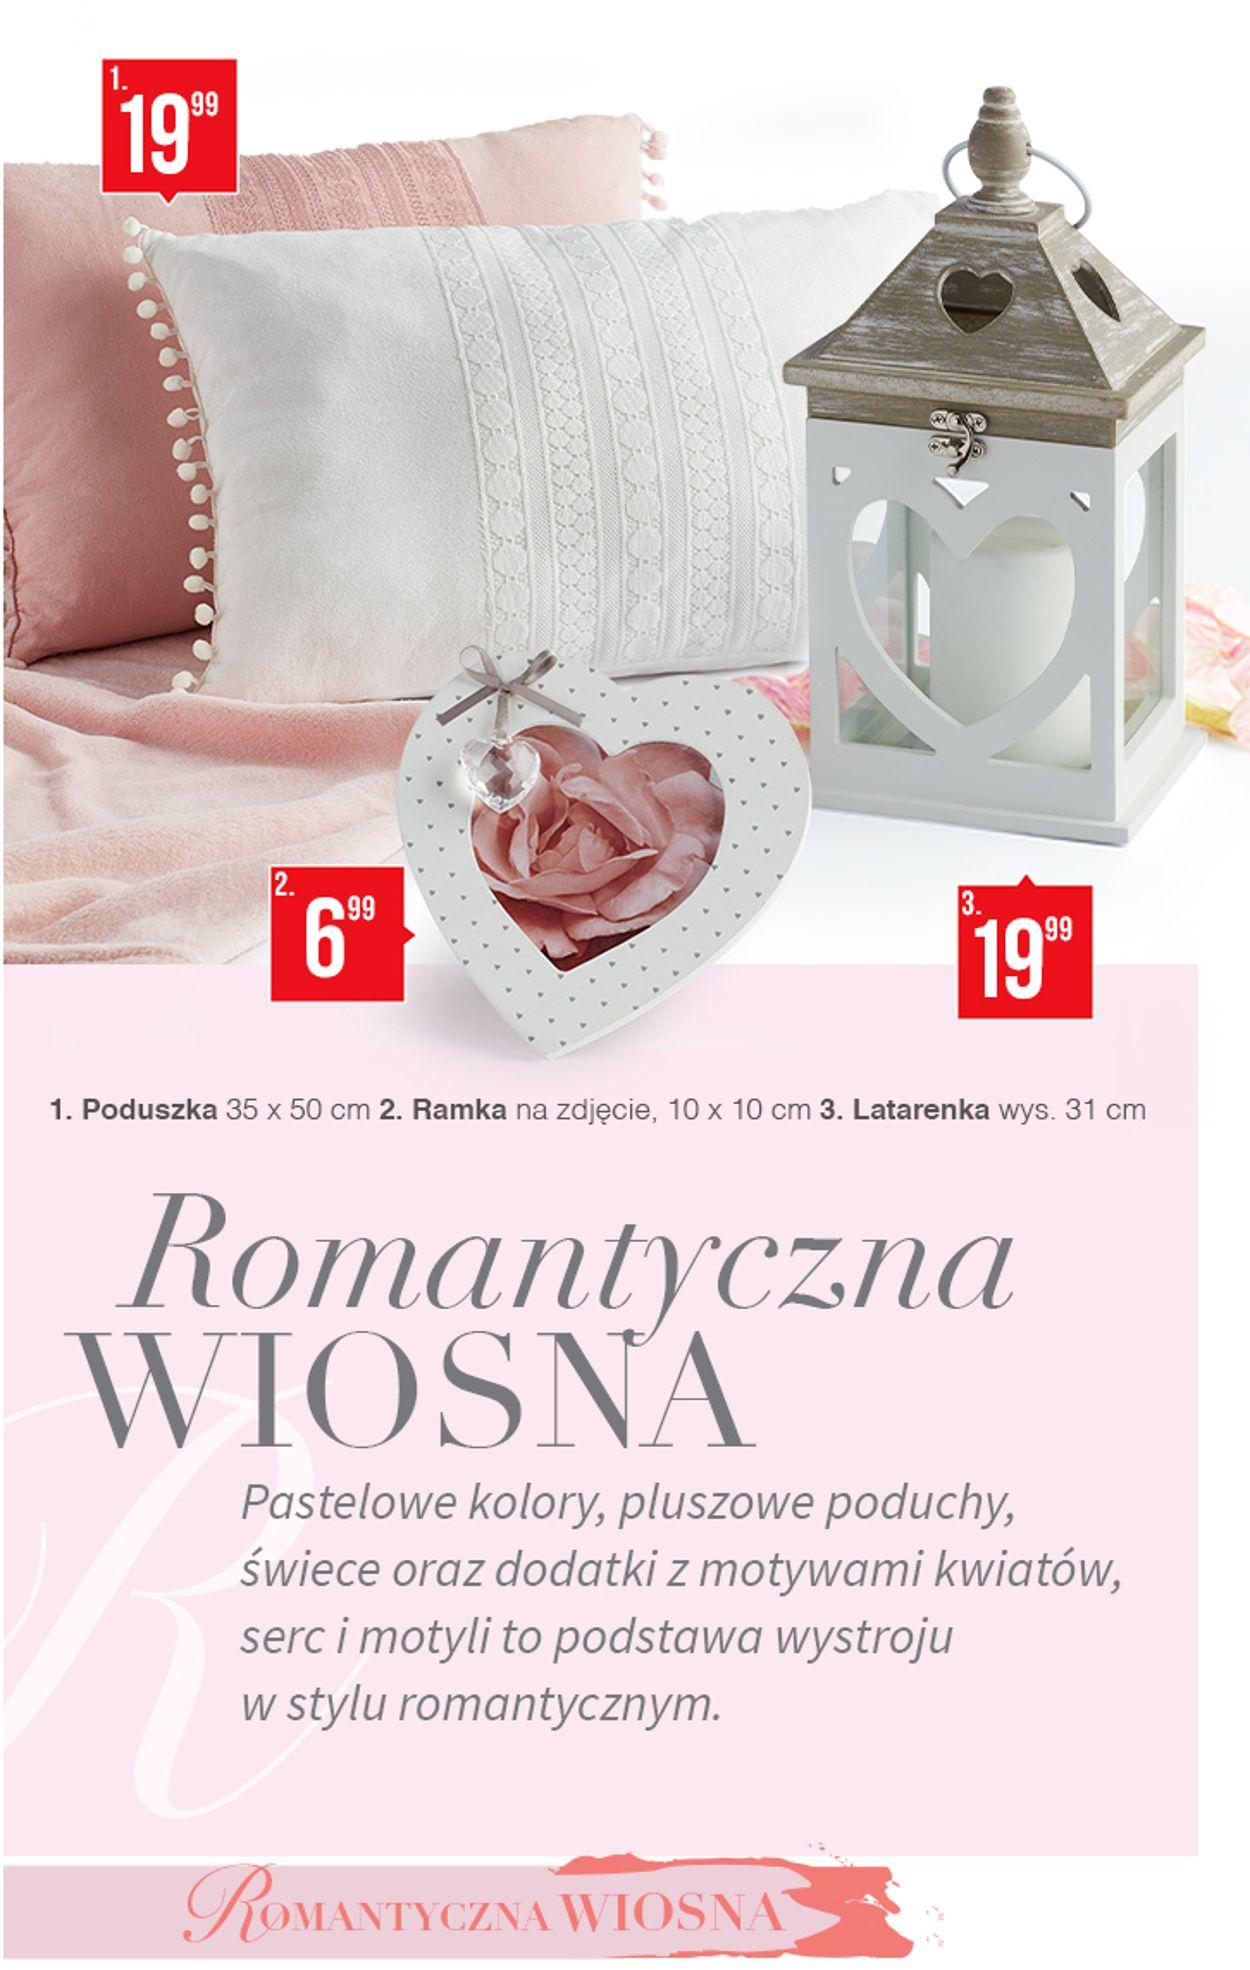 Gazetka promocyjna Pepco - 16.04-31.05.2020